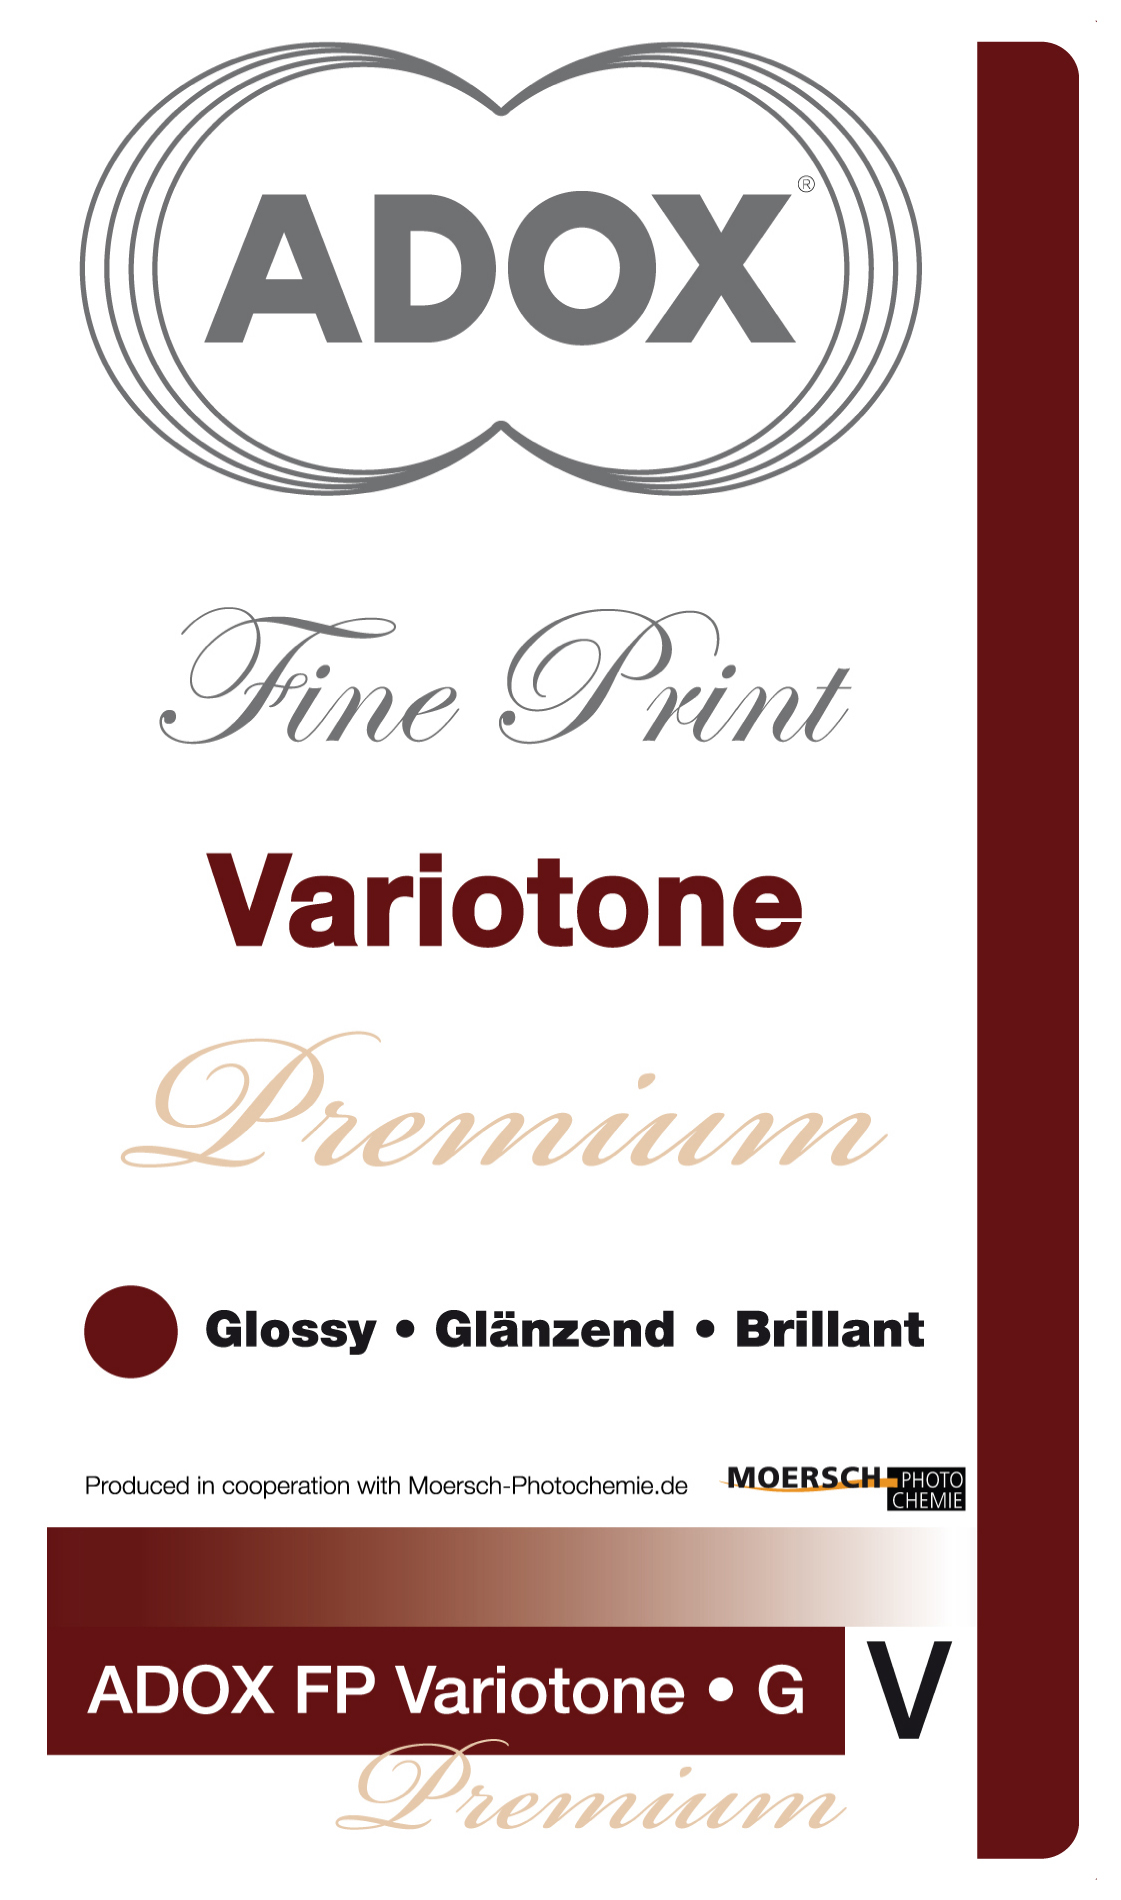 Фотобумага ADOX Variotone Premium Natural Fiber Base, глянцевая 30x40, 25 лКопировать товар